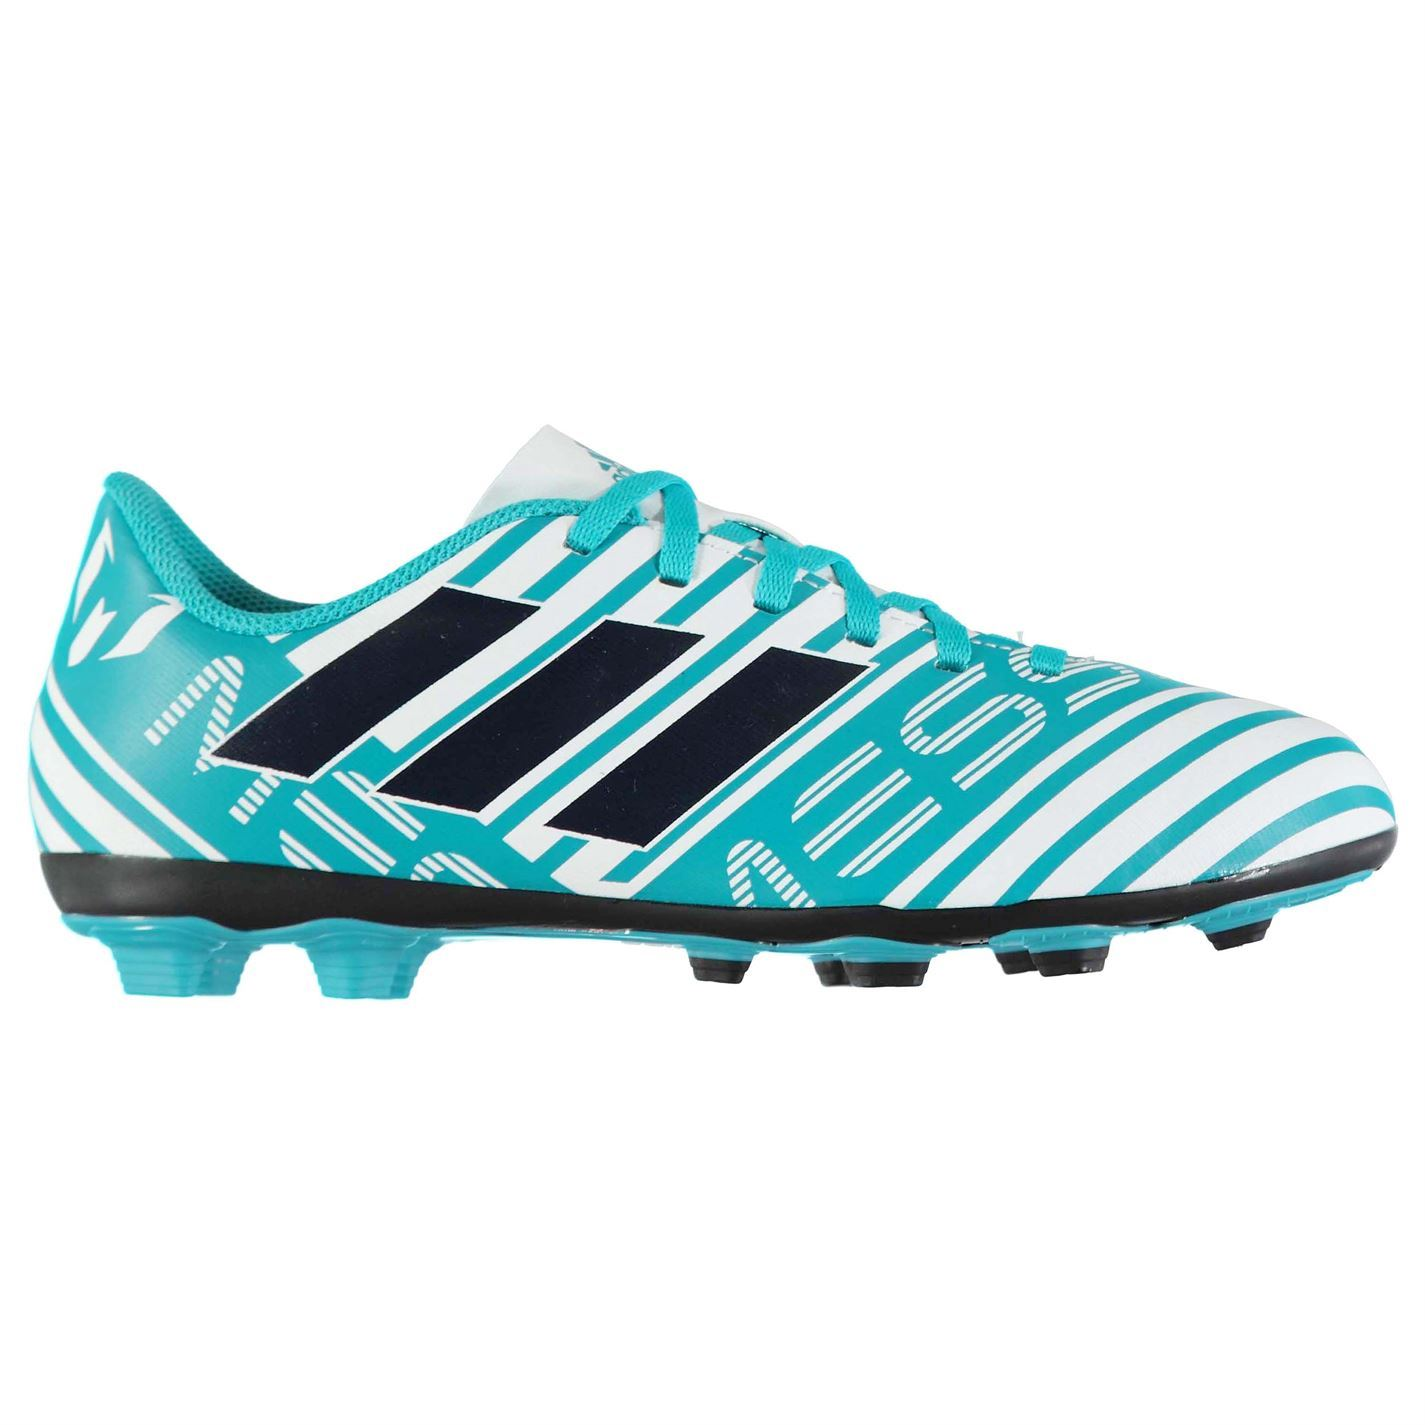 adidas Kids Nemeziz Messi 17.4 FG Junior Football Boots Firm Ground Lace Up bd3c54f50